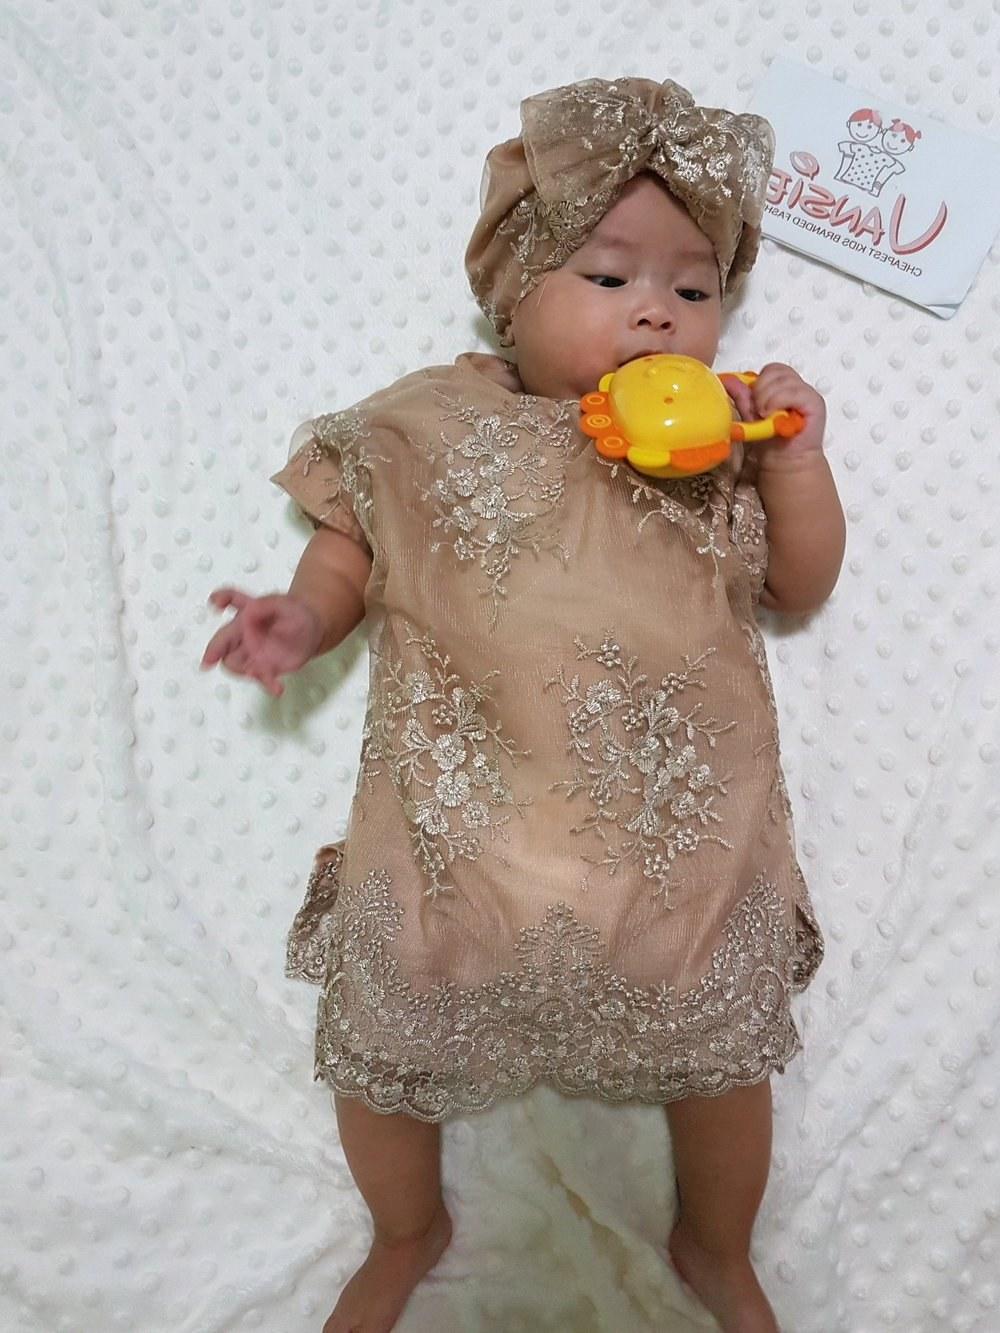 Inspirasi Baju Lebaran Untuk Bayi Perempuan Tqd3 Jual Baju Muslim Lebaran Bayi Anak Kaftan Set Turban